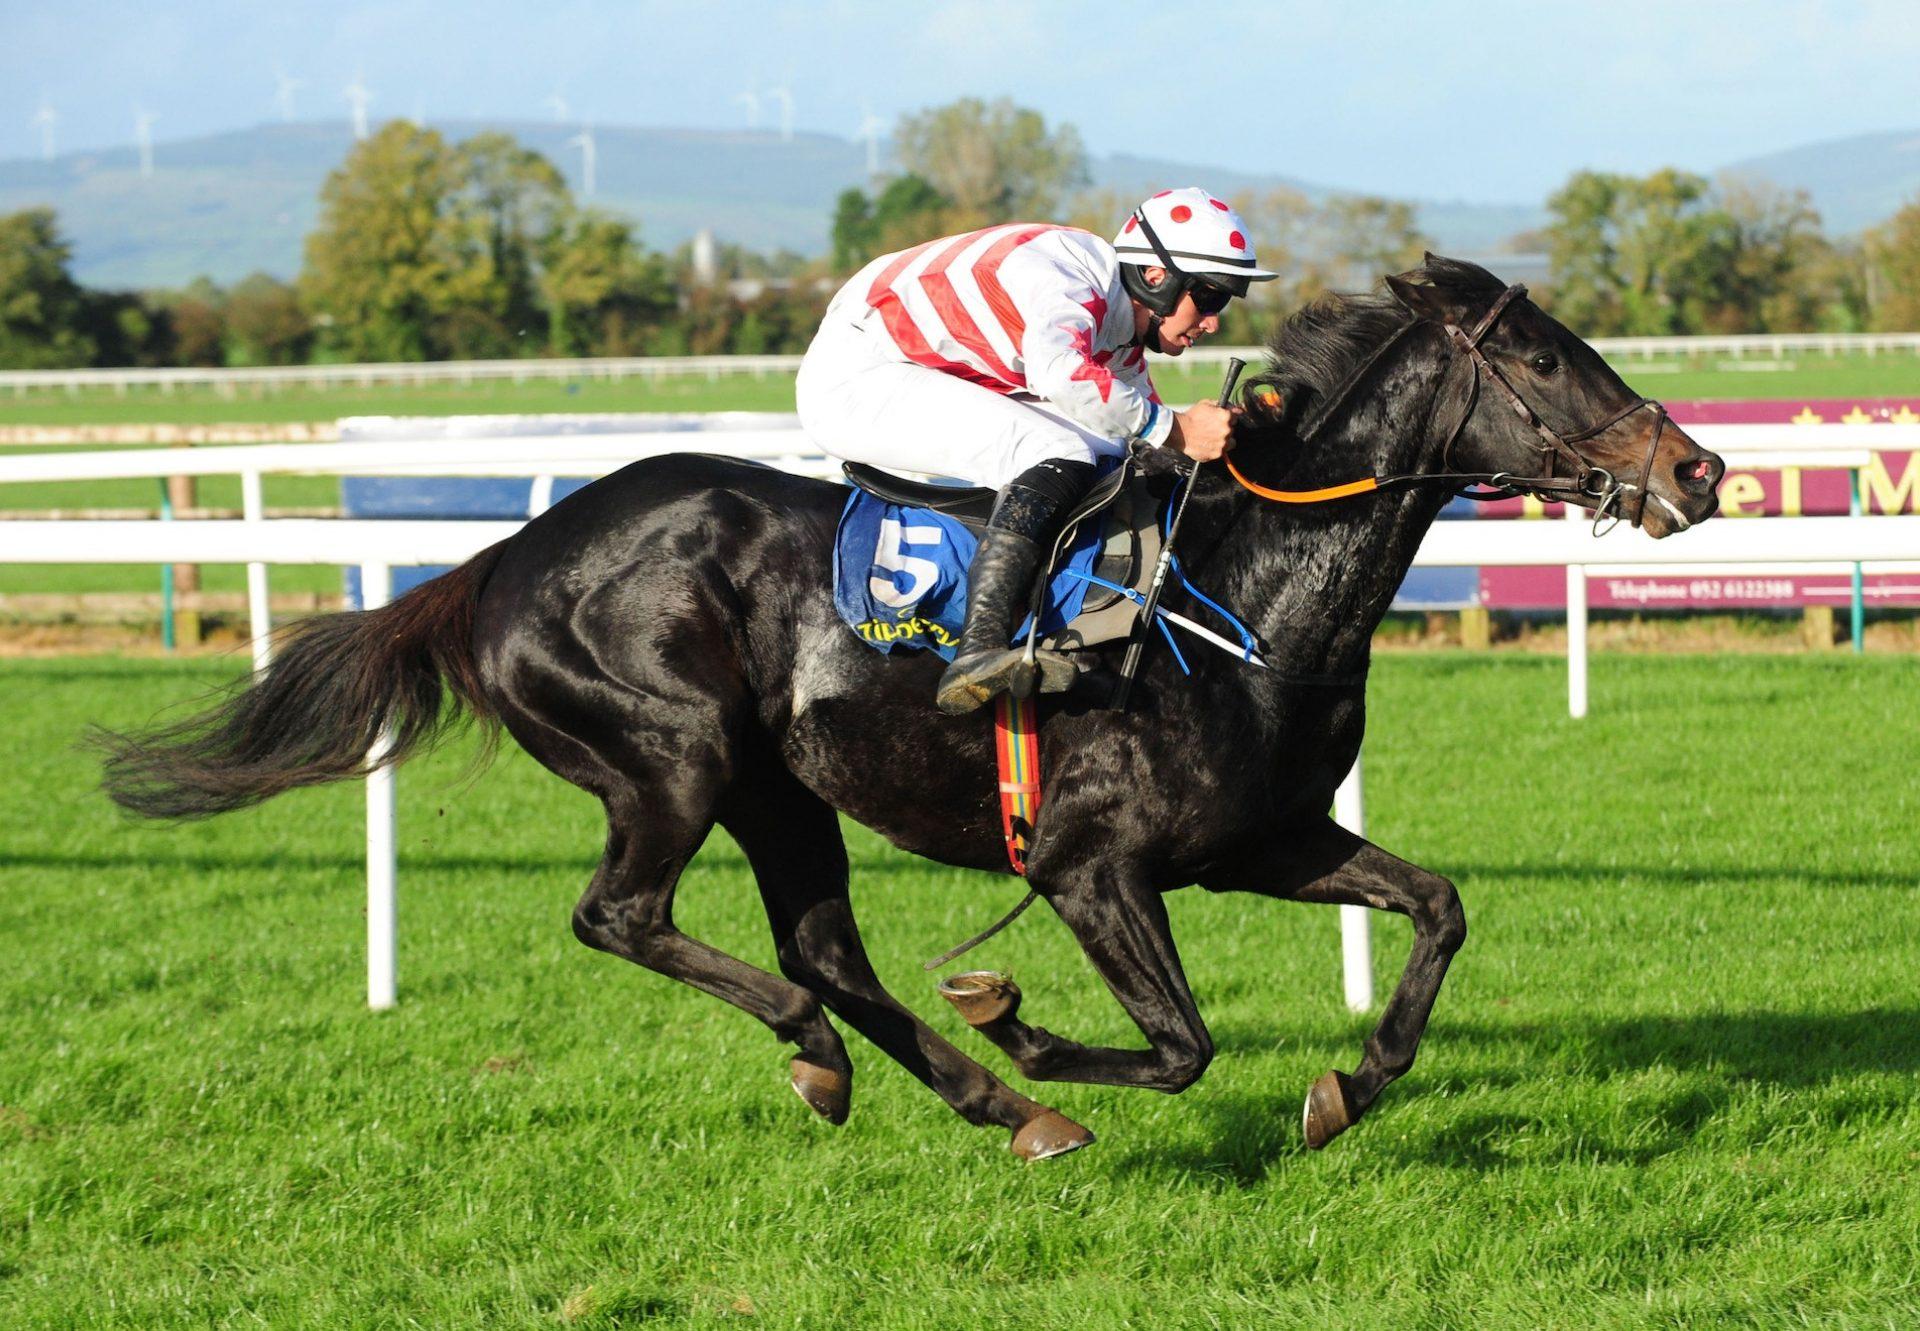 Seventh Heaven (Galileo) winning the G1 Irish Oaks at the Curragh